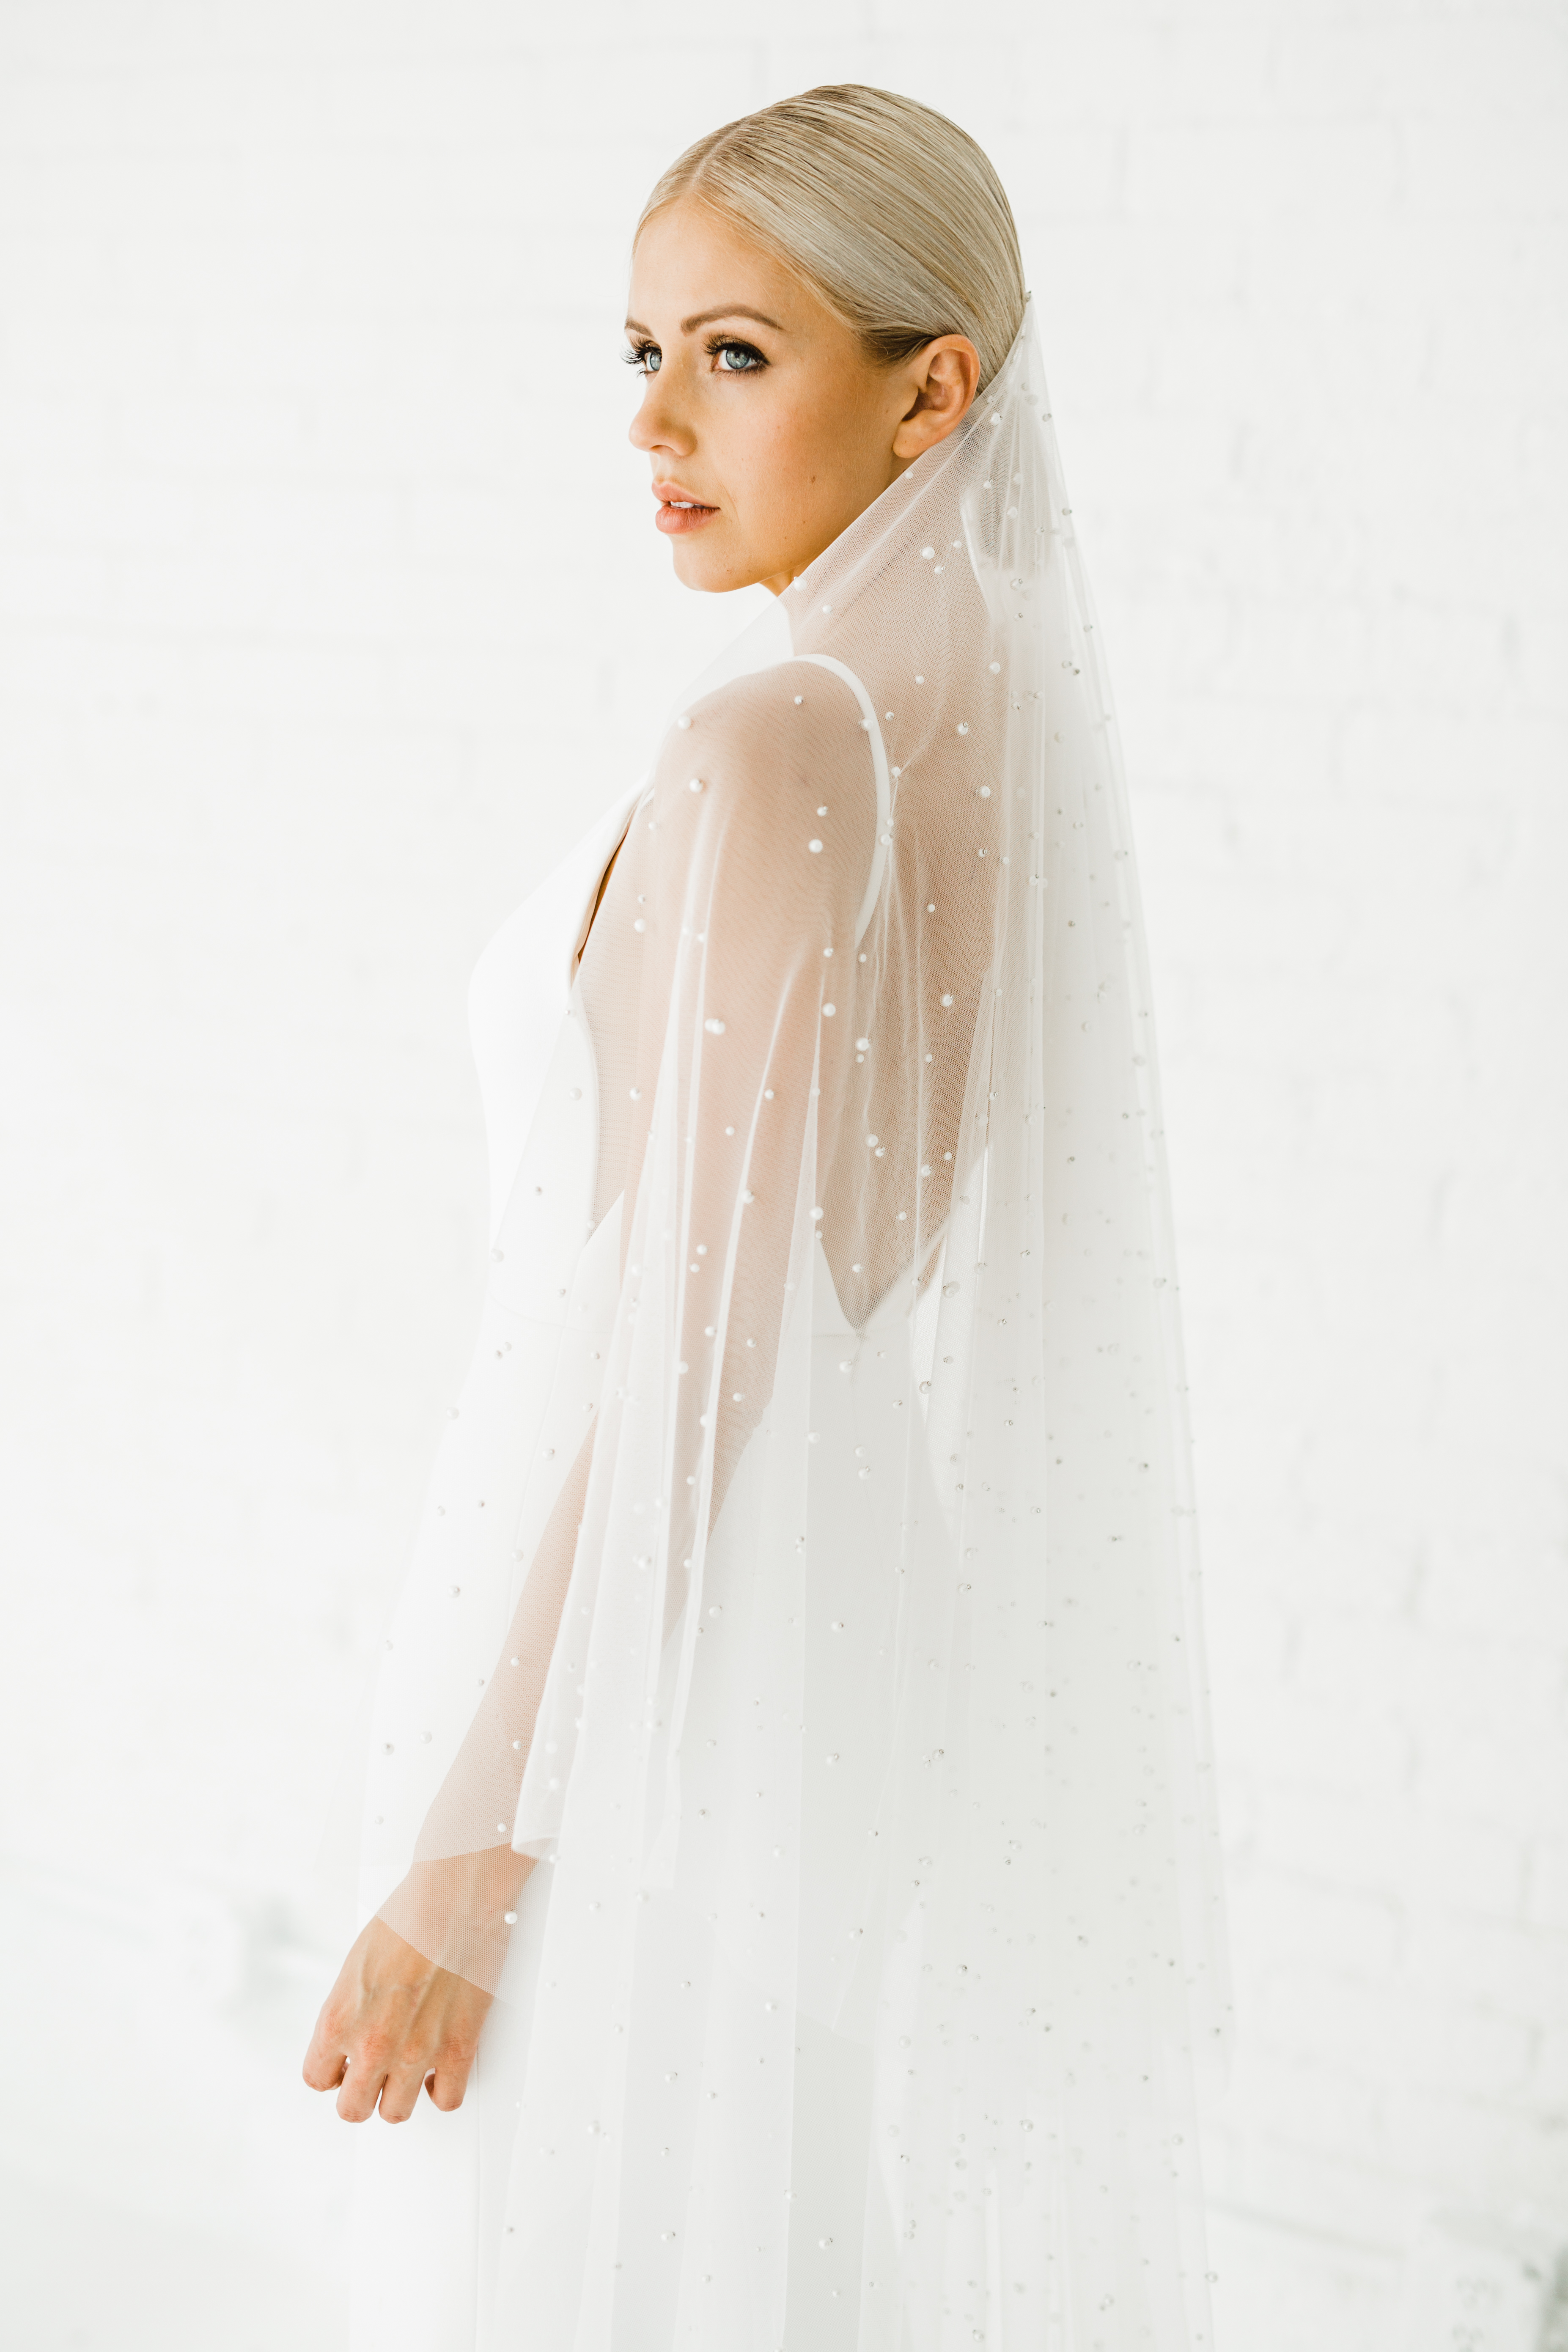 bride wearing pearl-studded veil